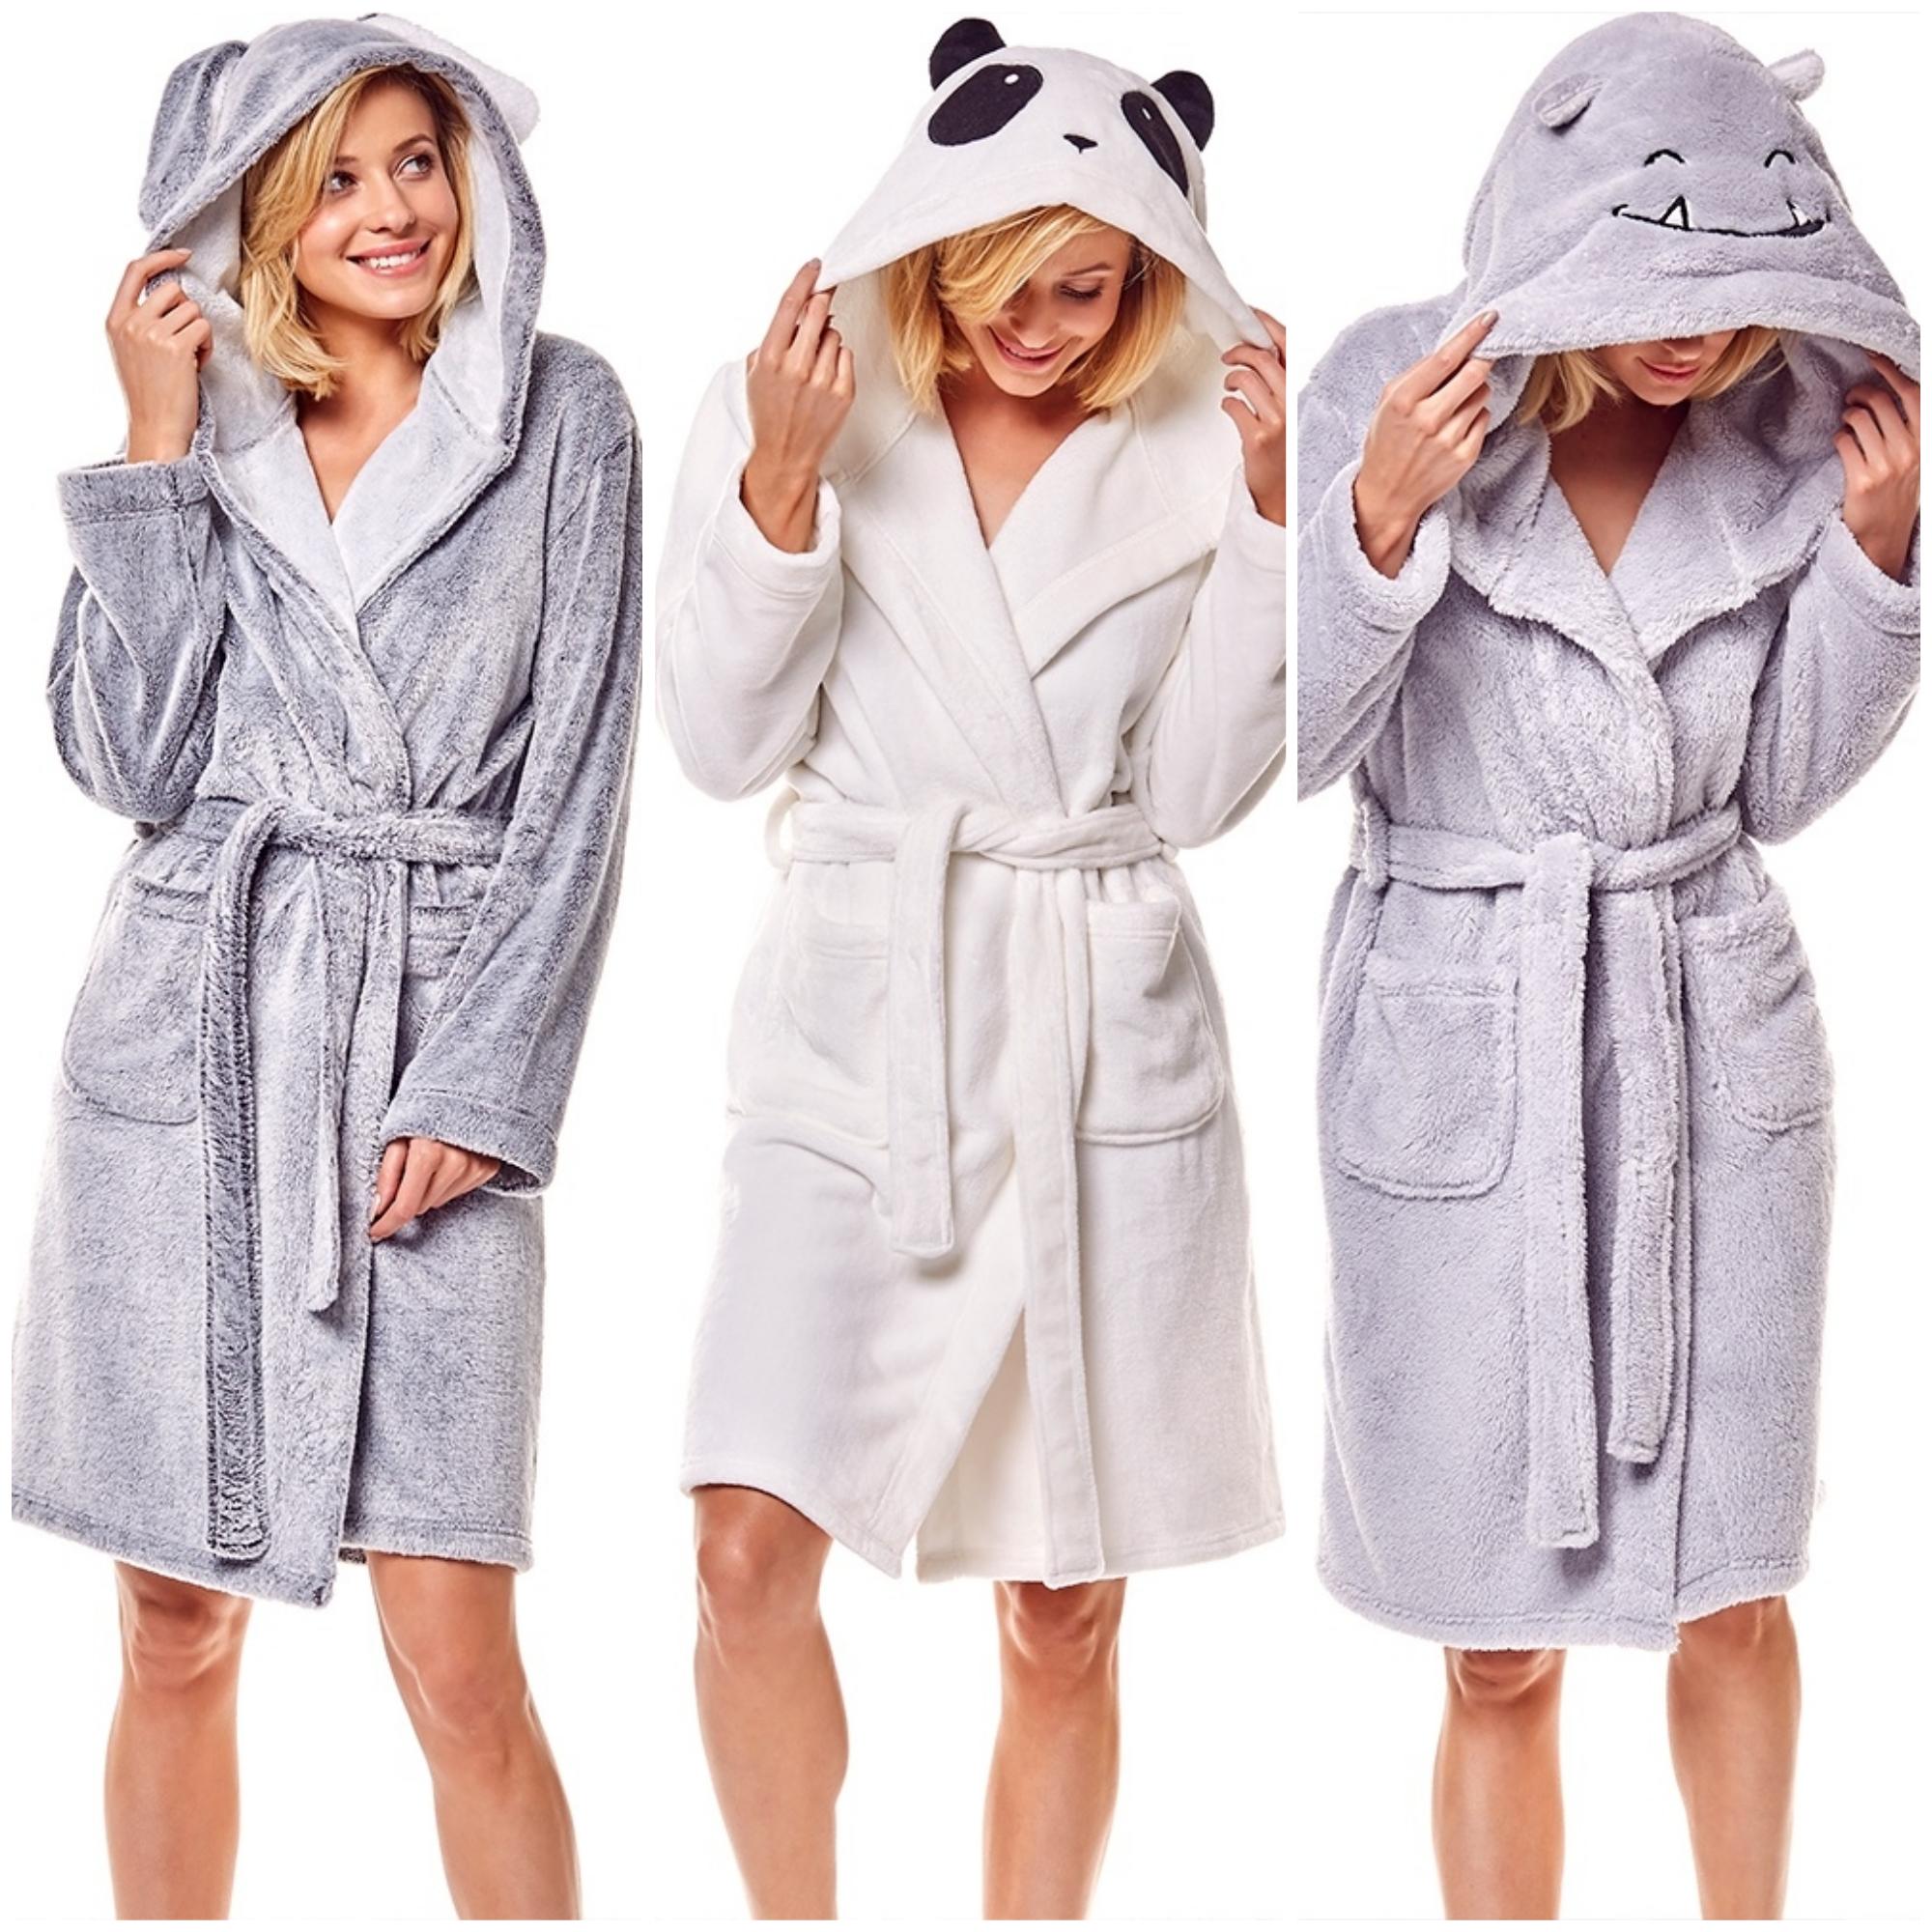 Henderson Lady женские халаты купить